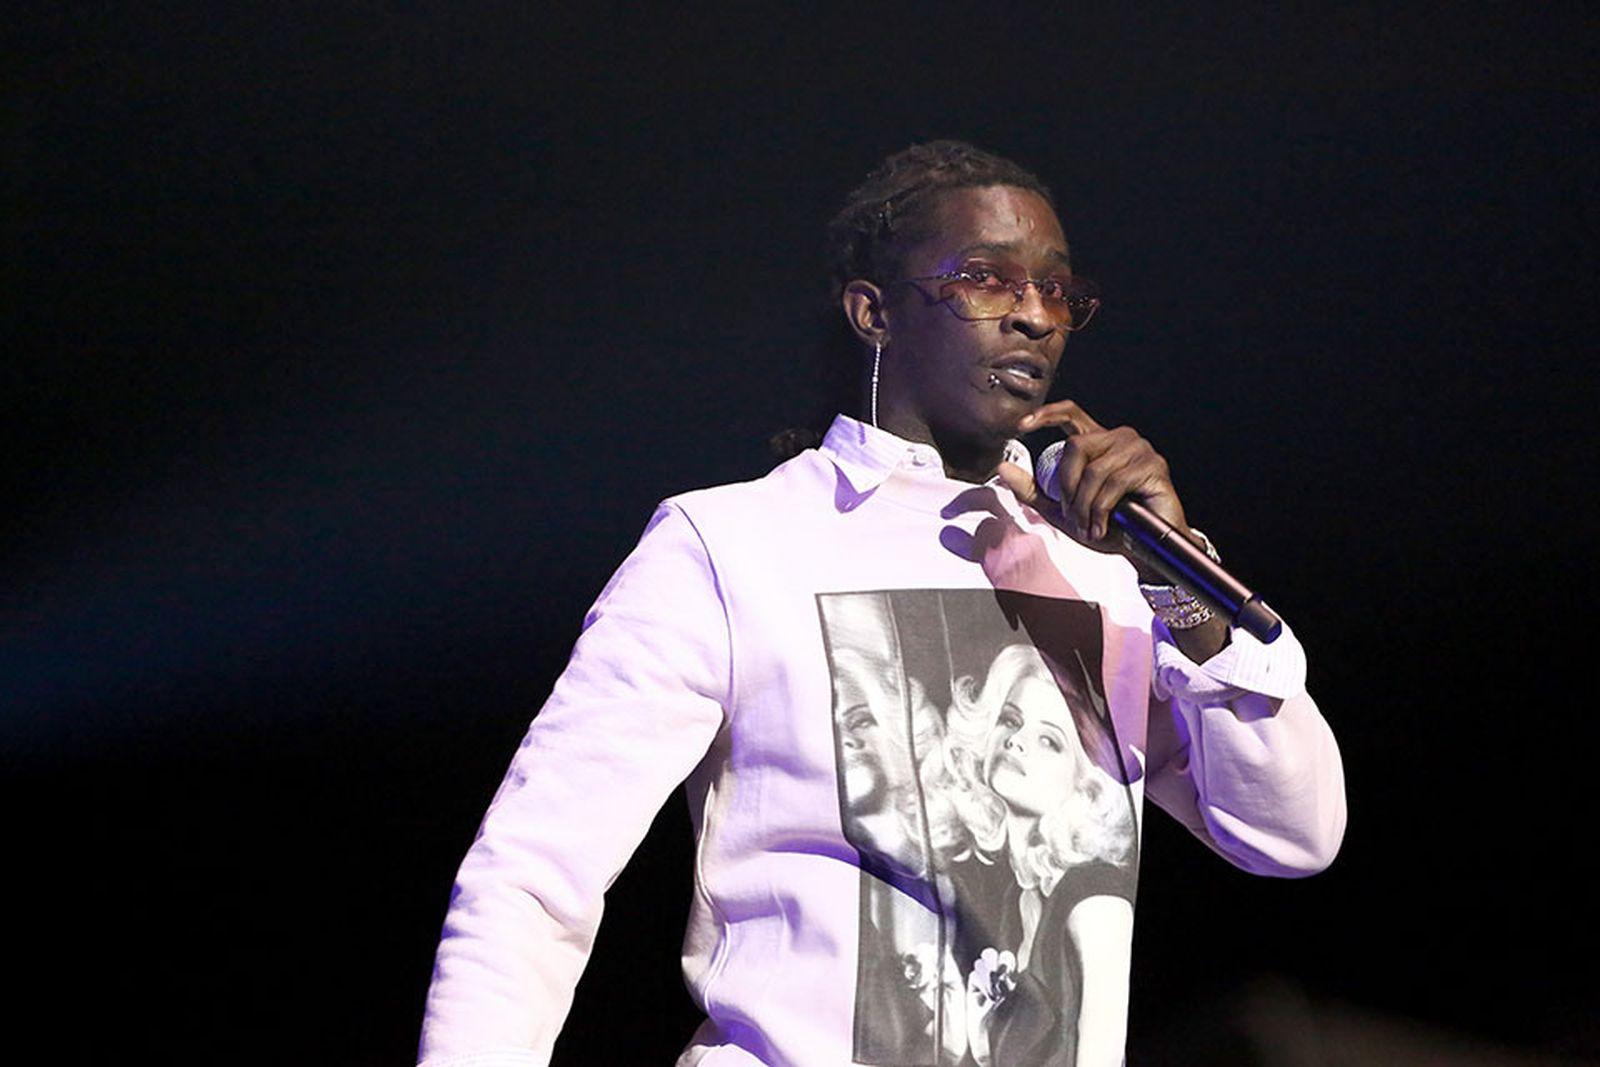 rappers real names list Desiigner lil skies wiz khalifa